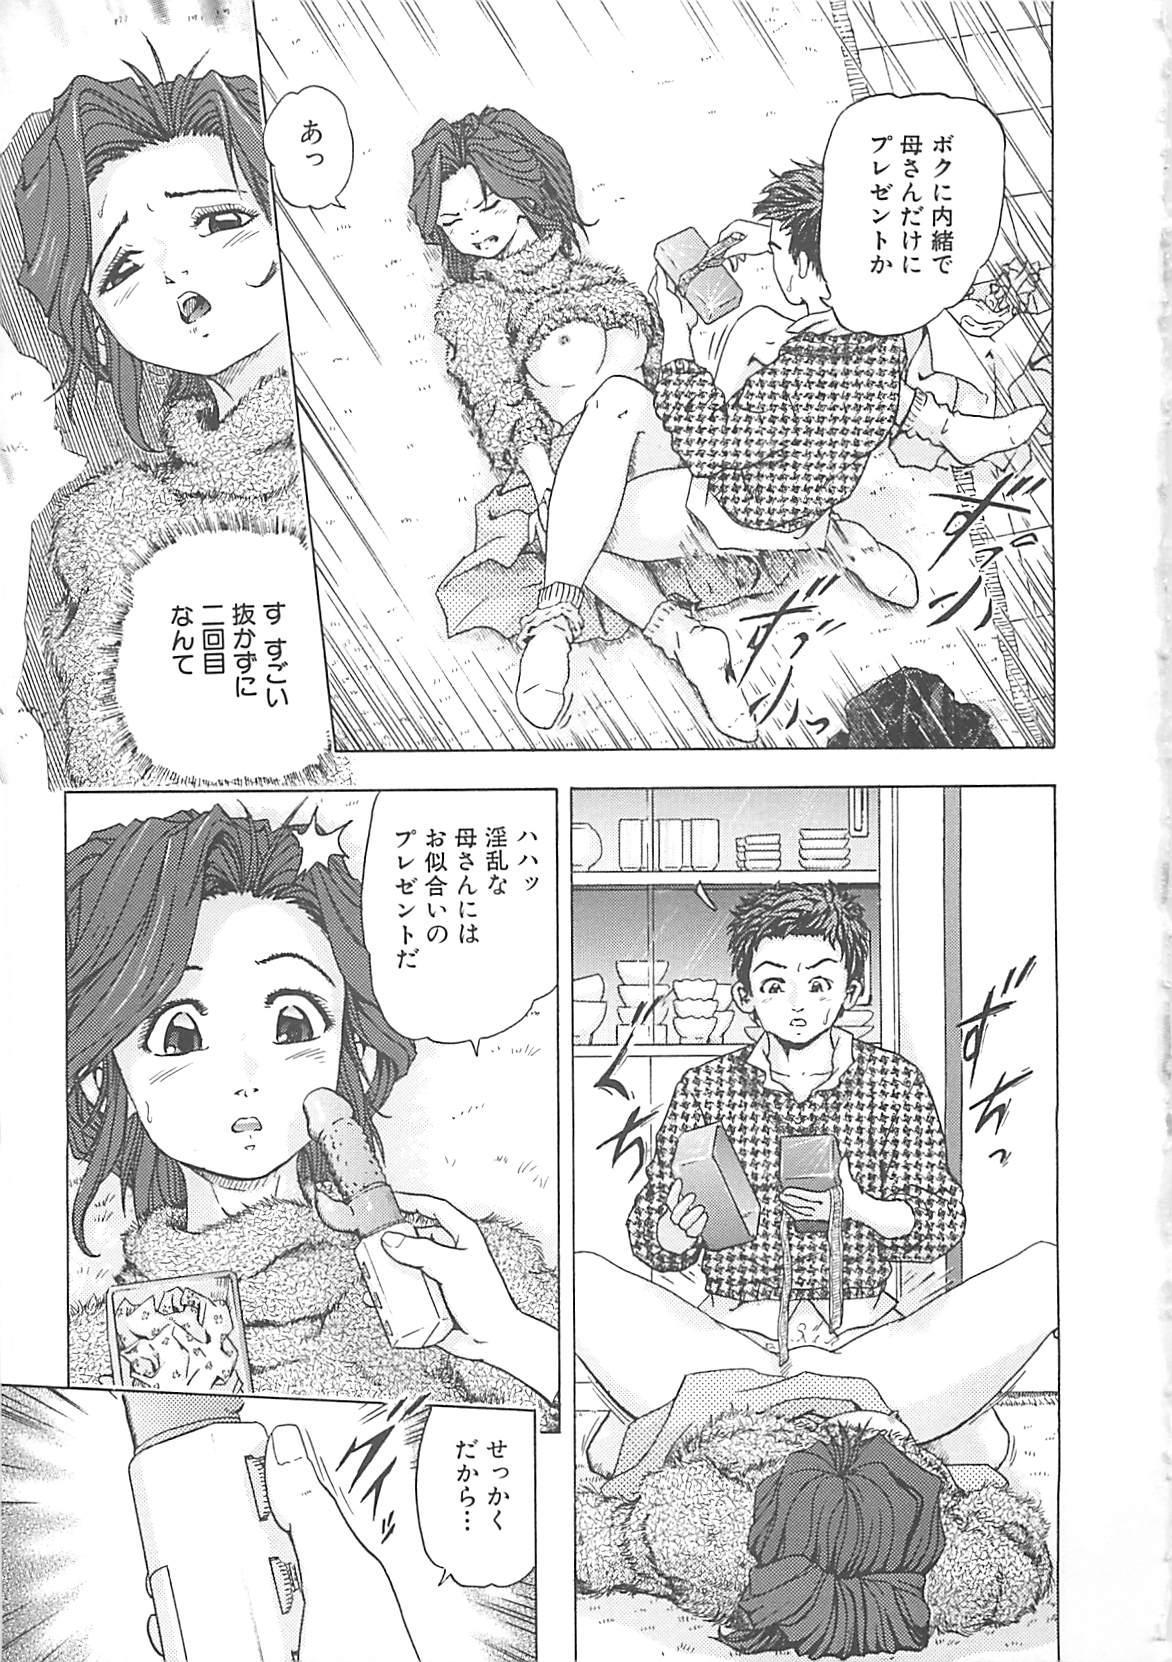 Kanin Kyoushitsu - Adultery Classroom 127